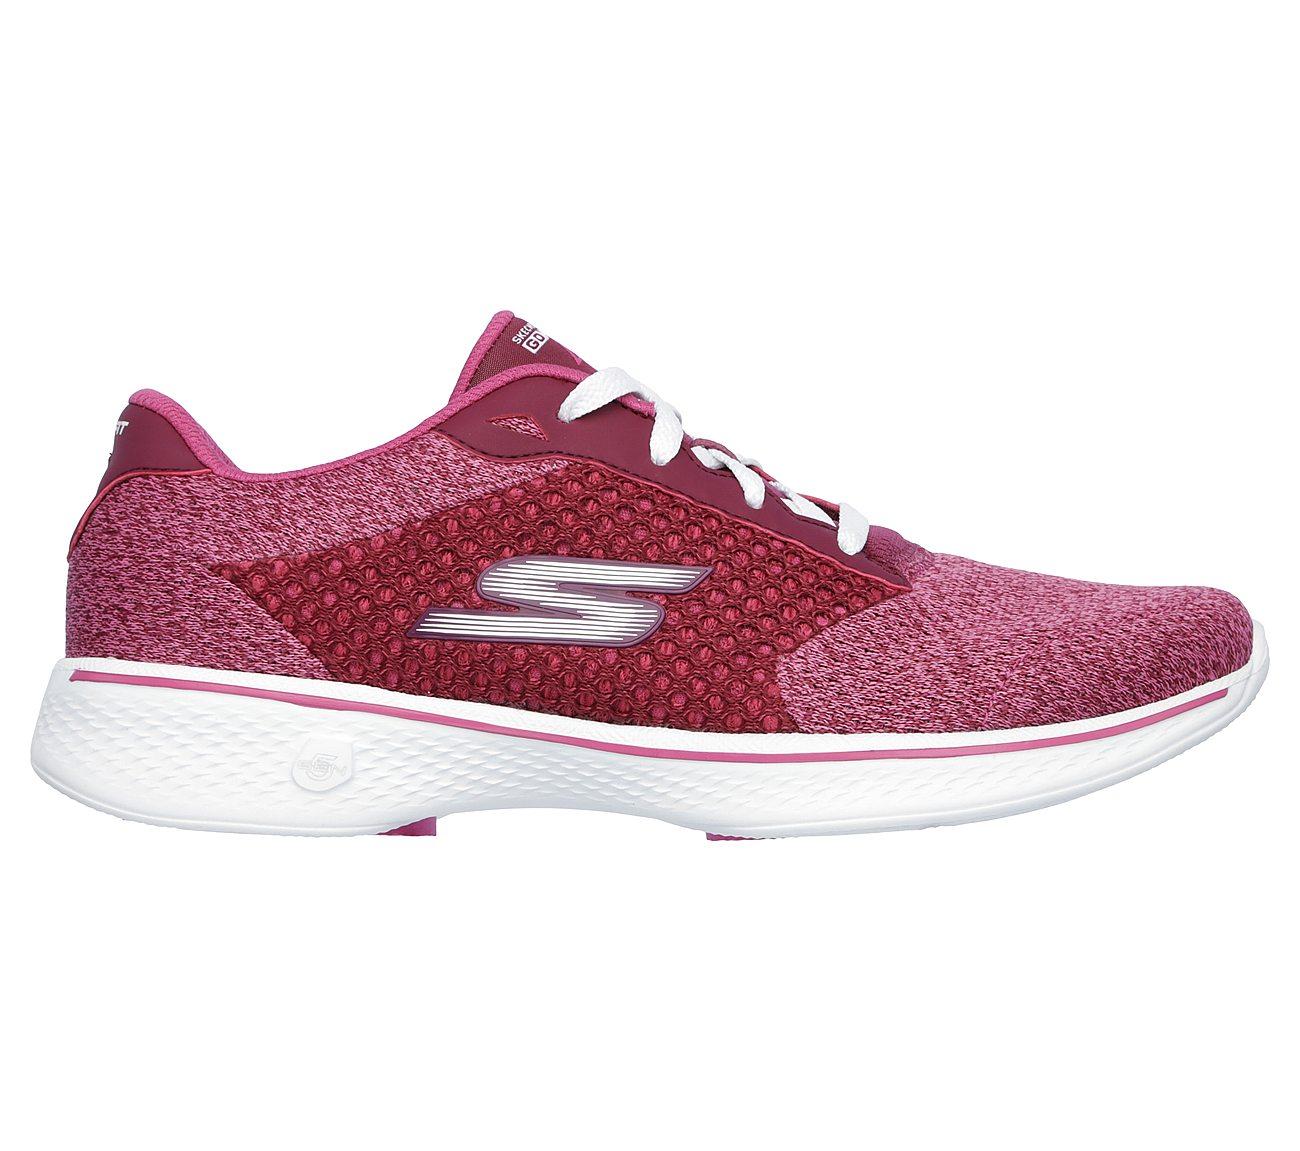 SKECHERS Performance Go Walk 4 (Purple) Damen Schuhe